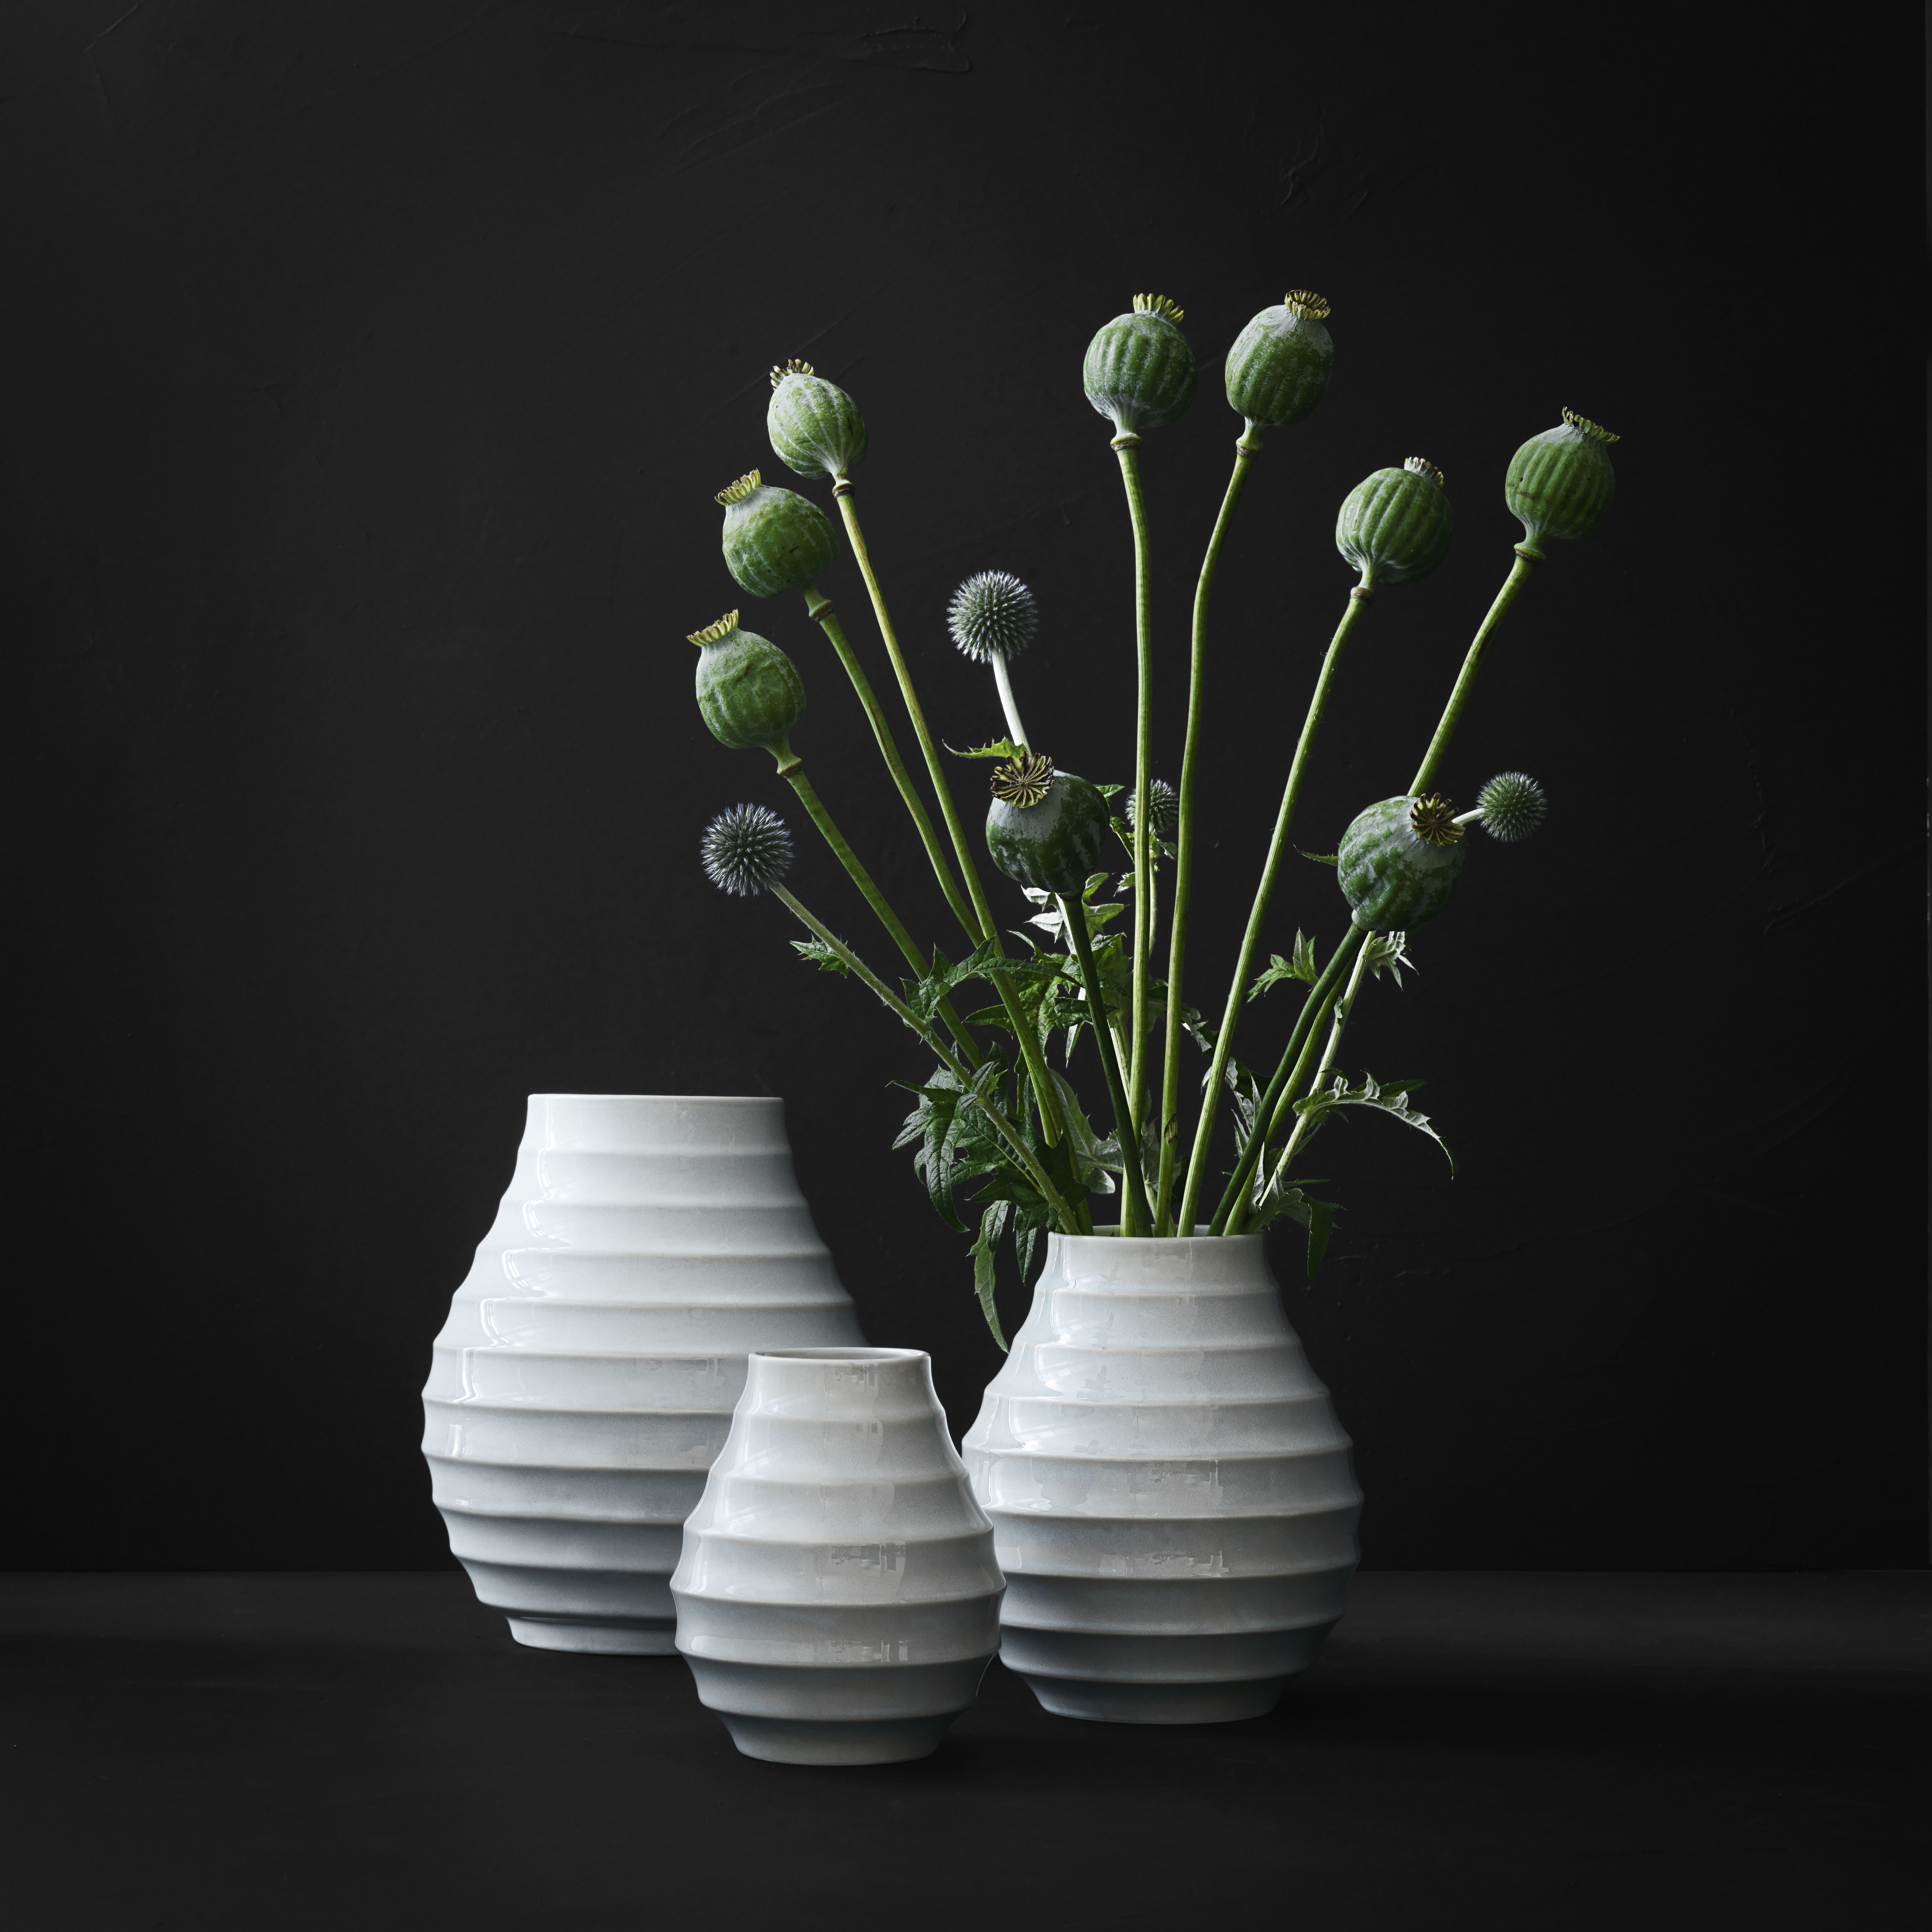 morso bark vases - small, medium, large